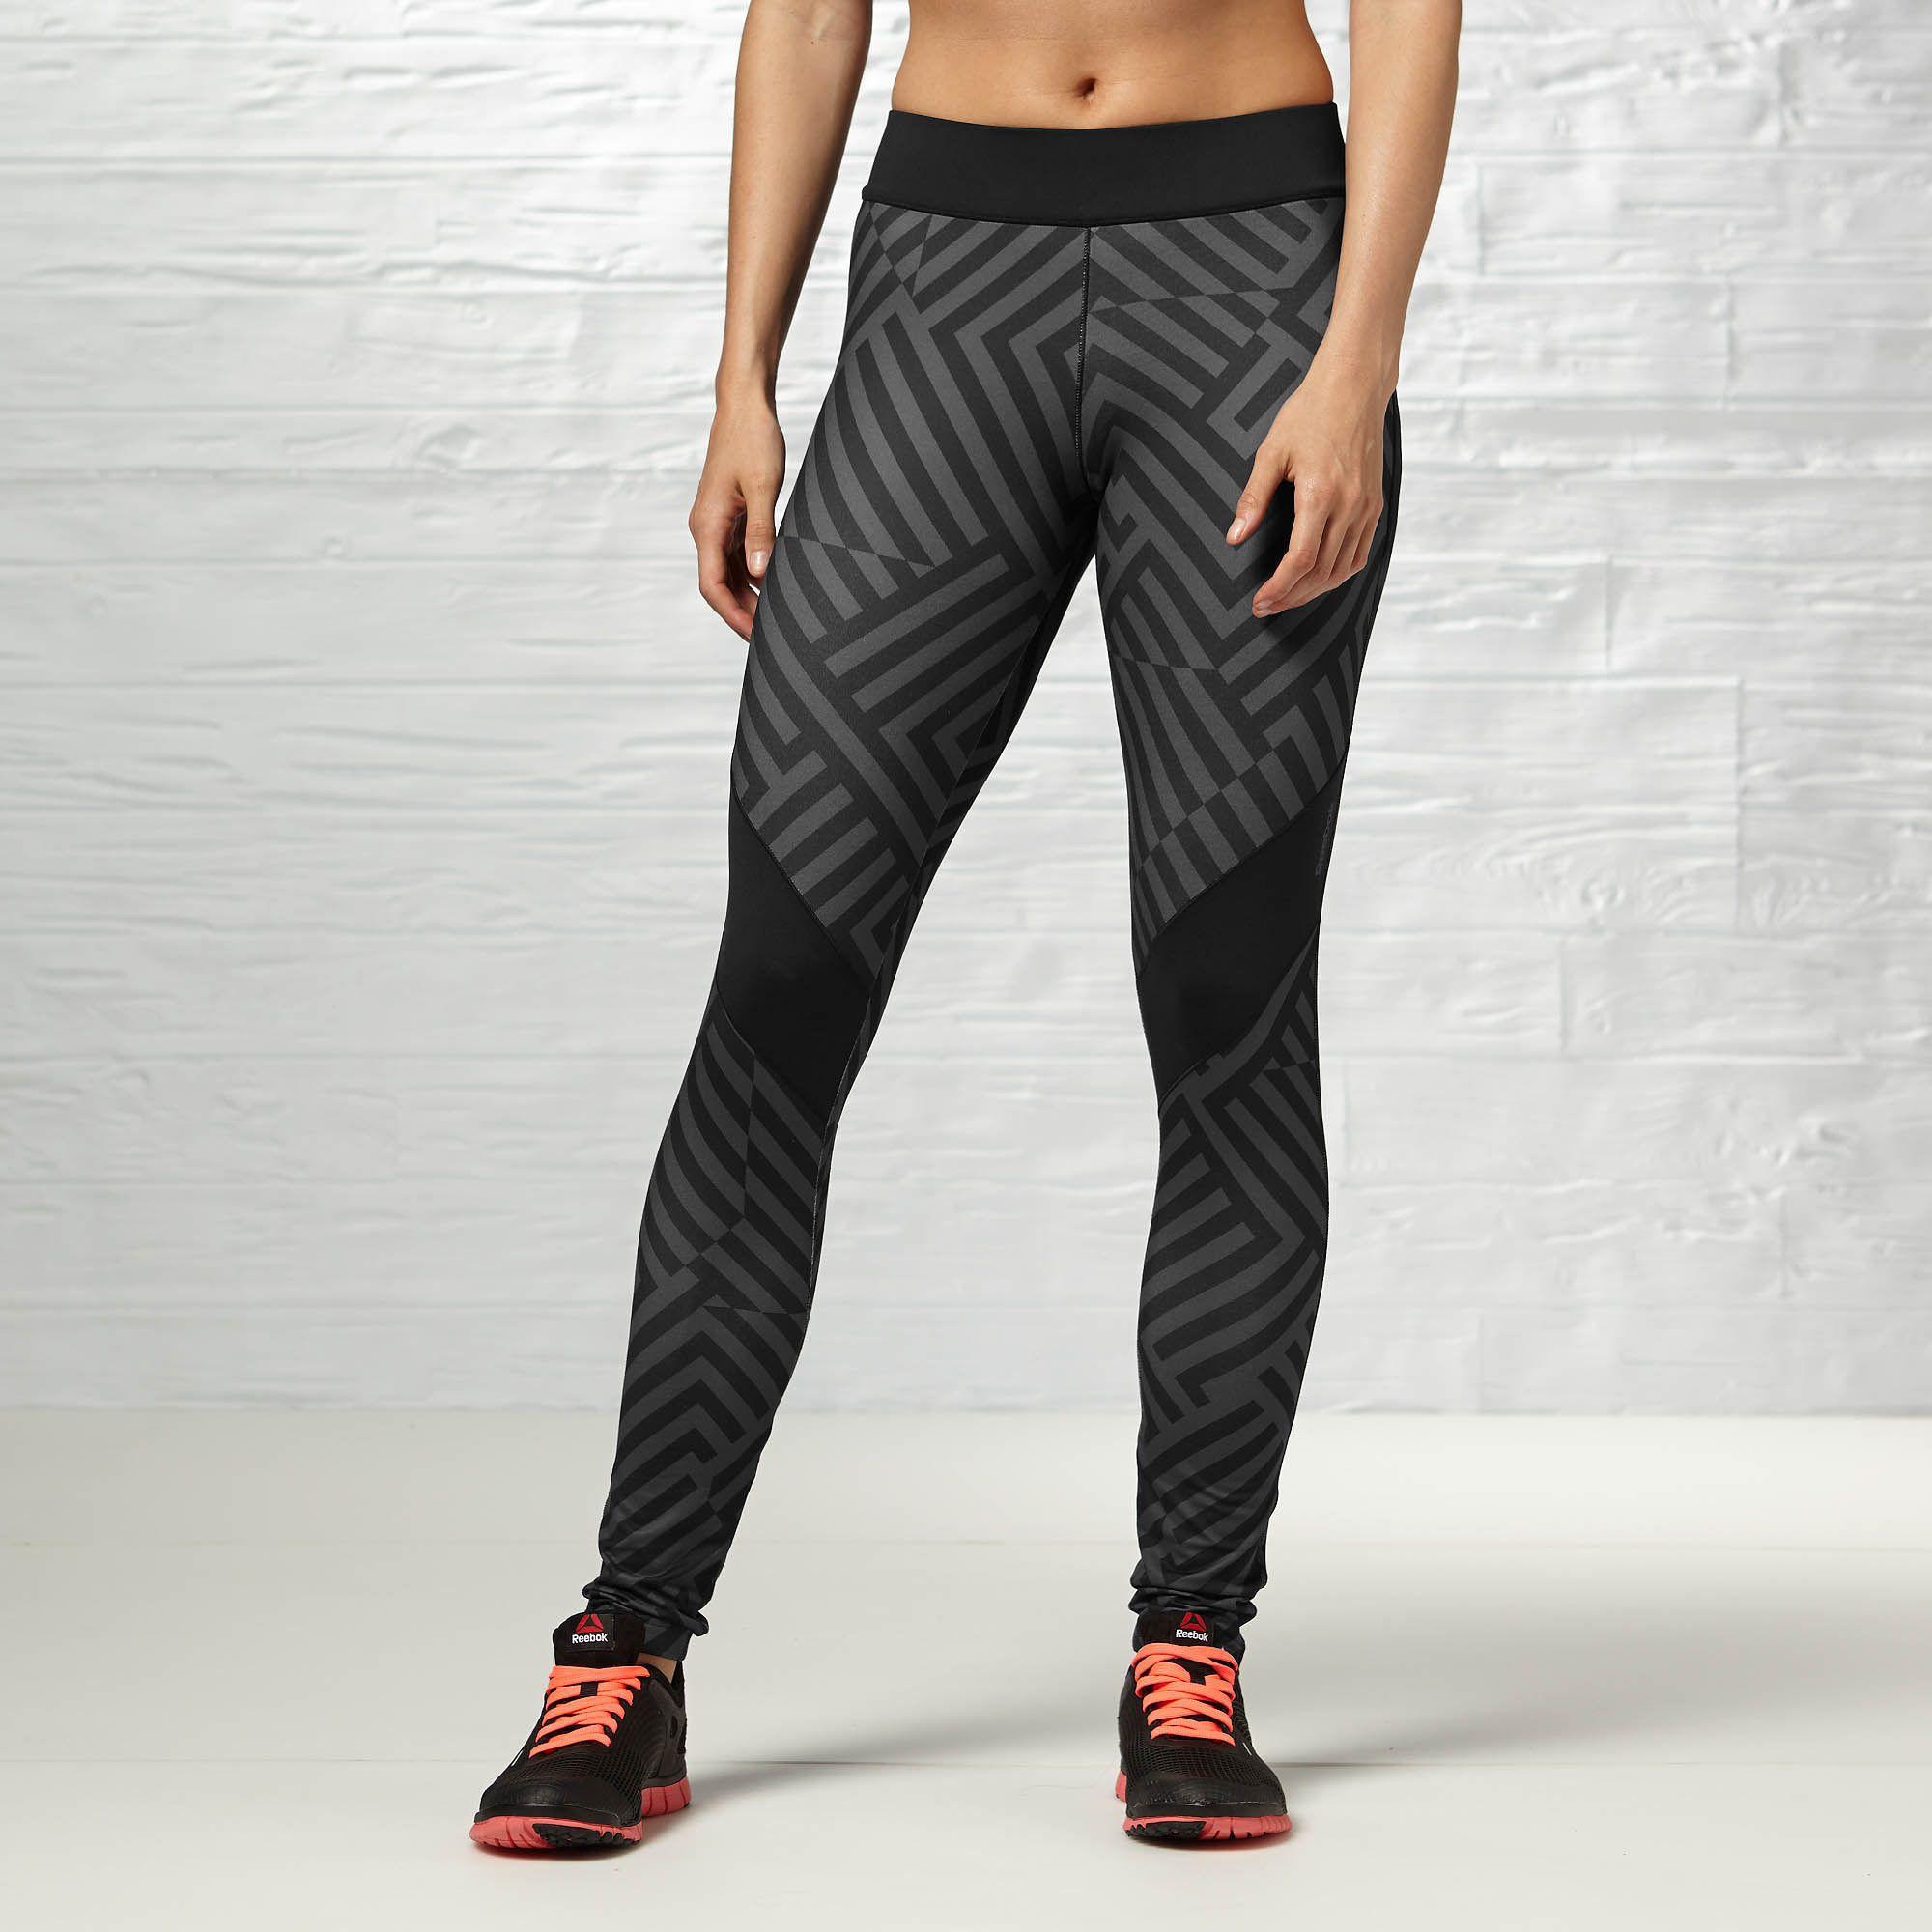 Reebok Urban Active Pat Legging Reebok Gb Clothes For Women Clothes Reebok Women